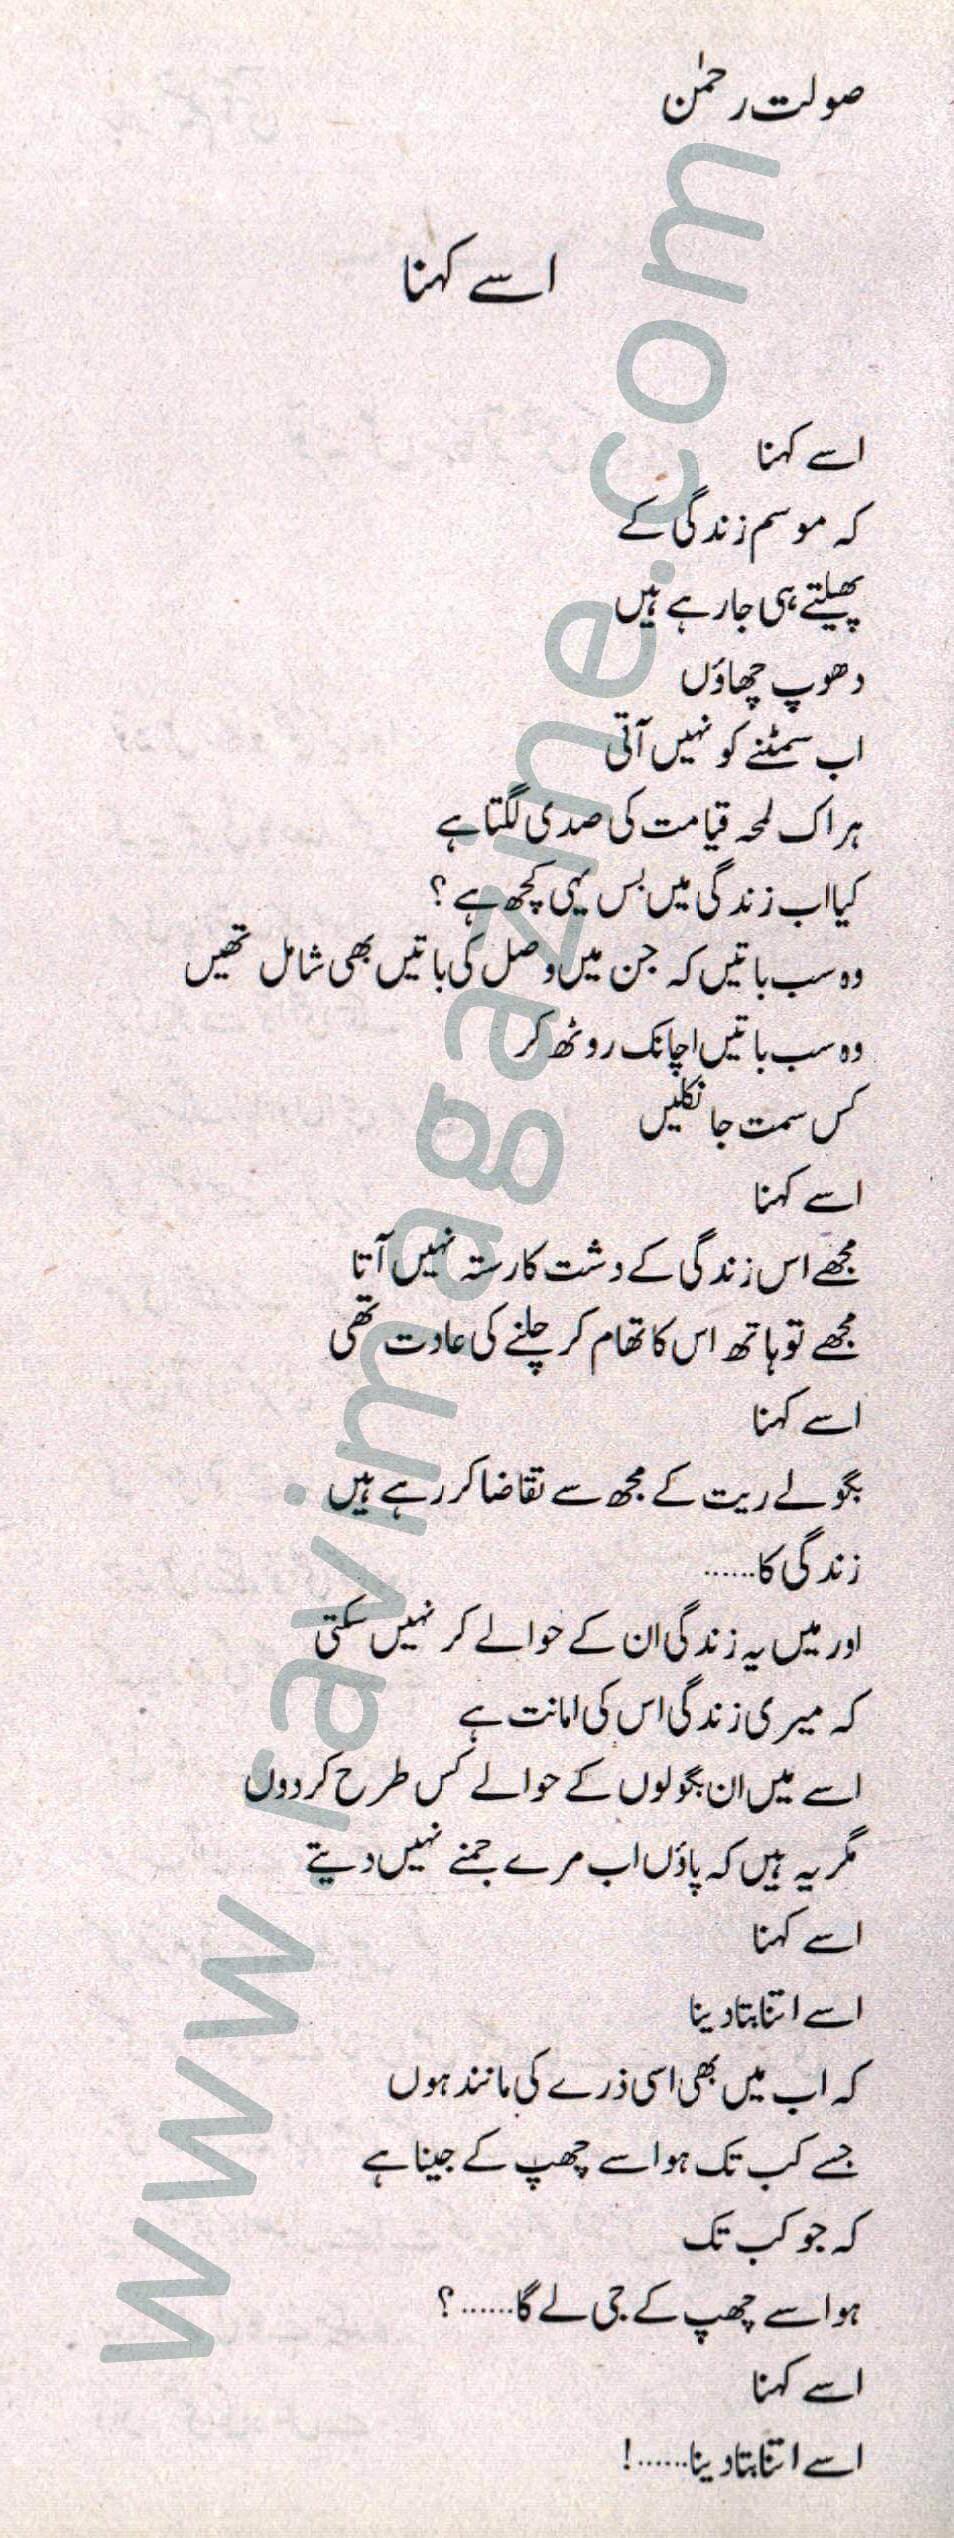 Ussay Kehna – Solat Rehman